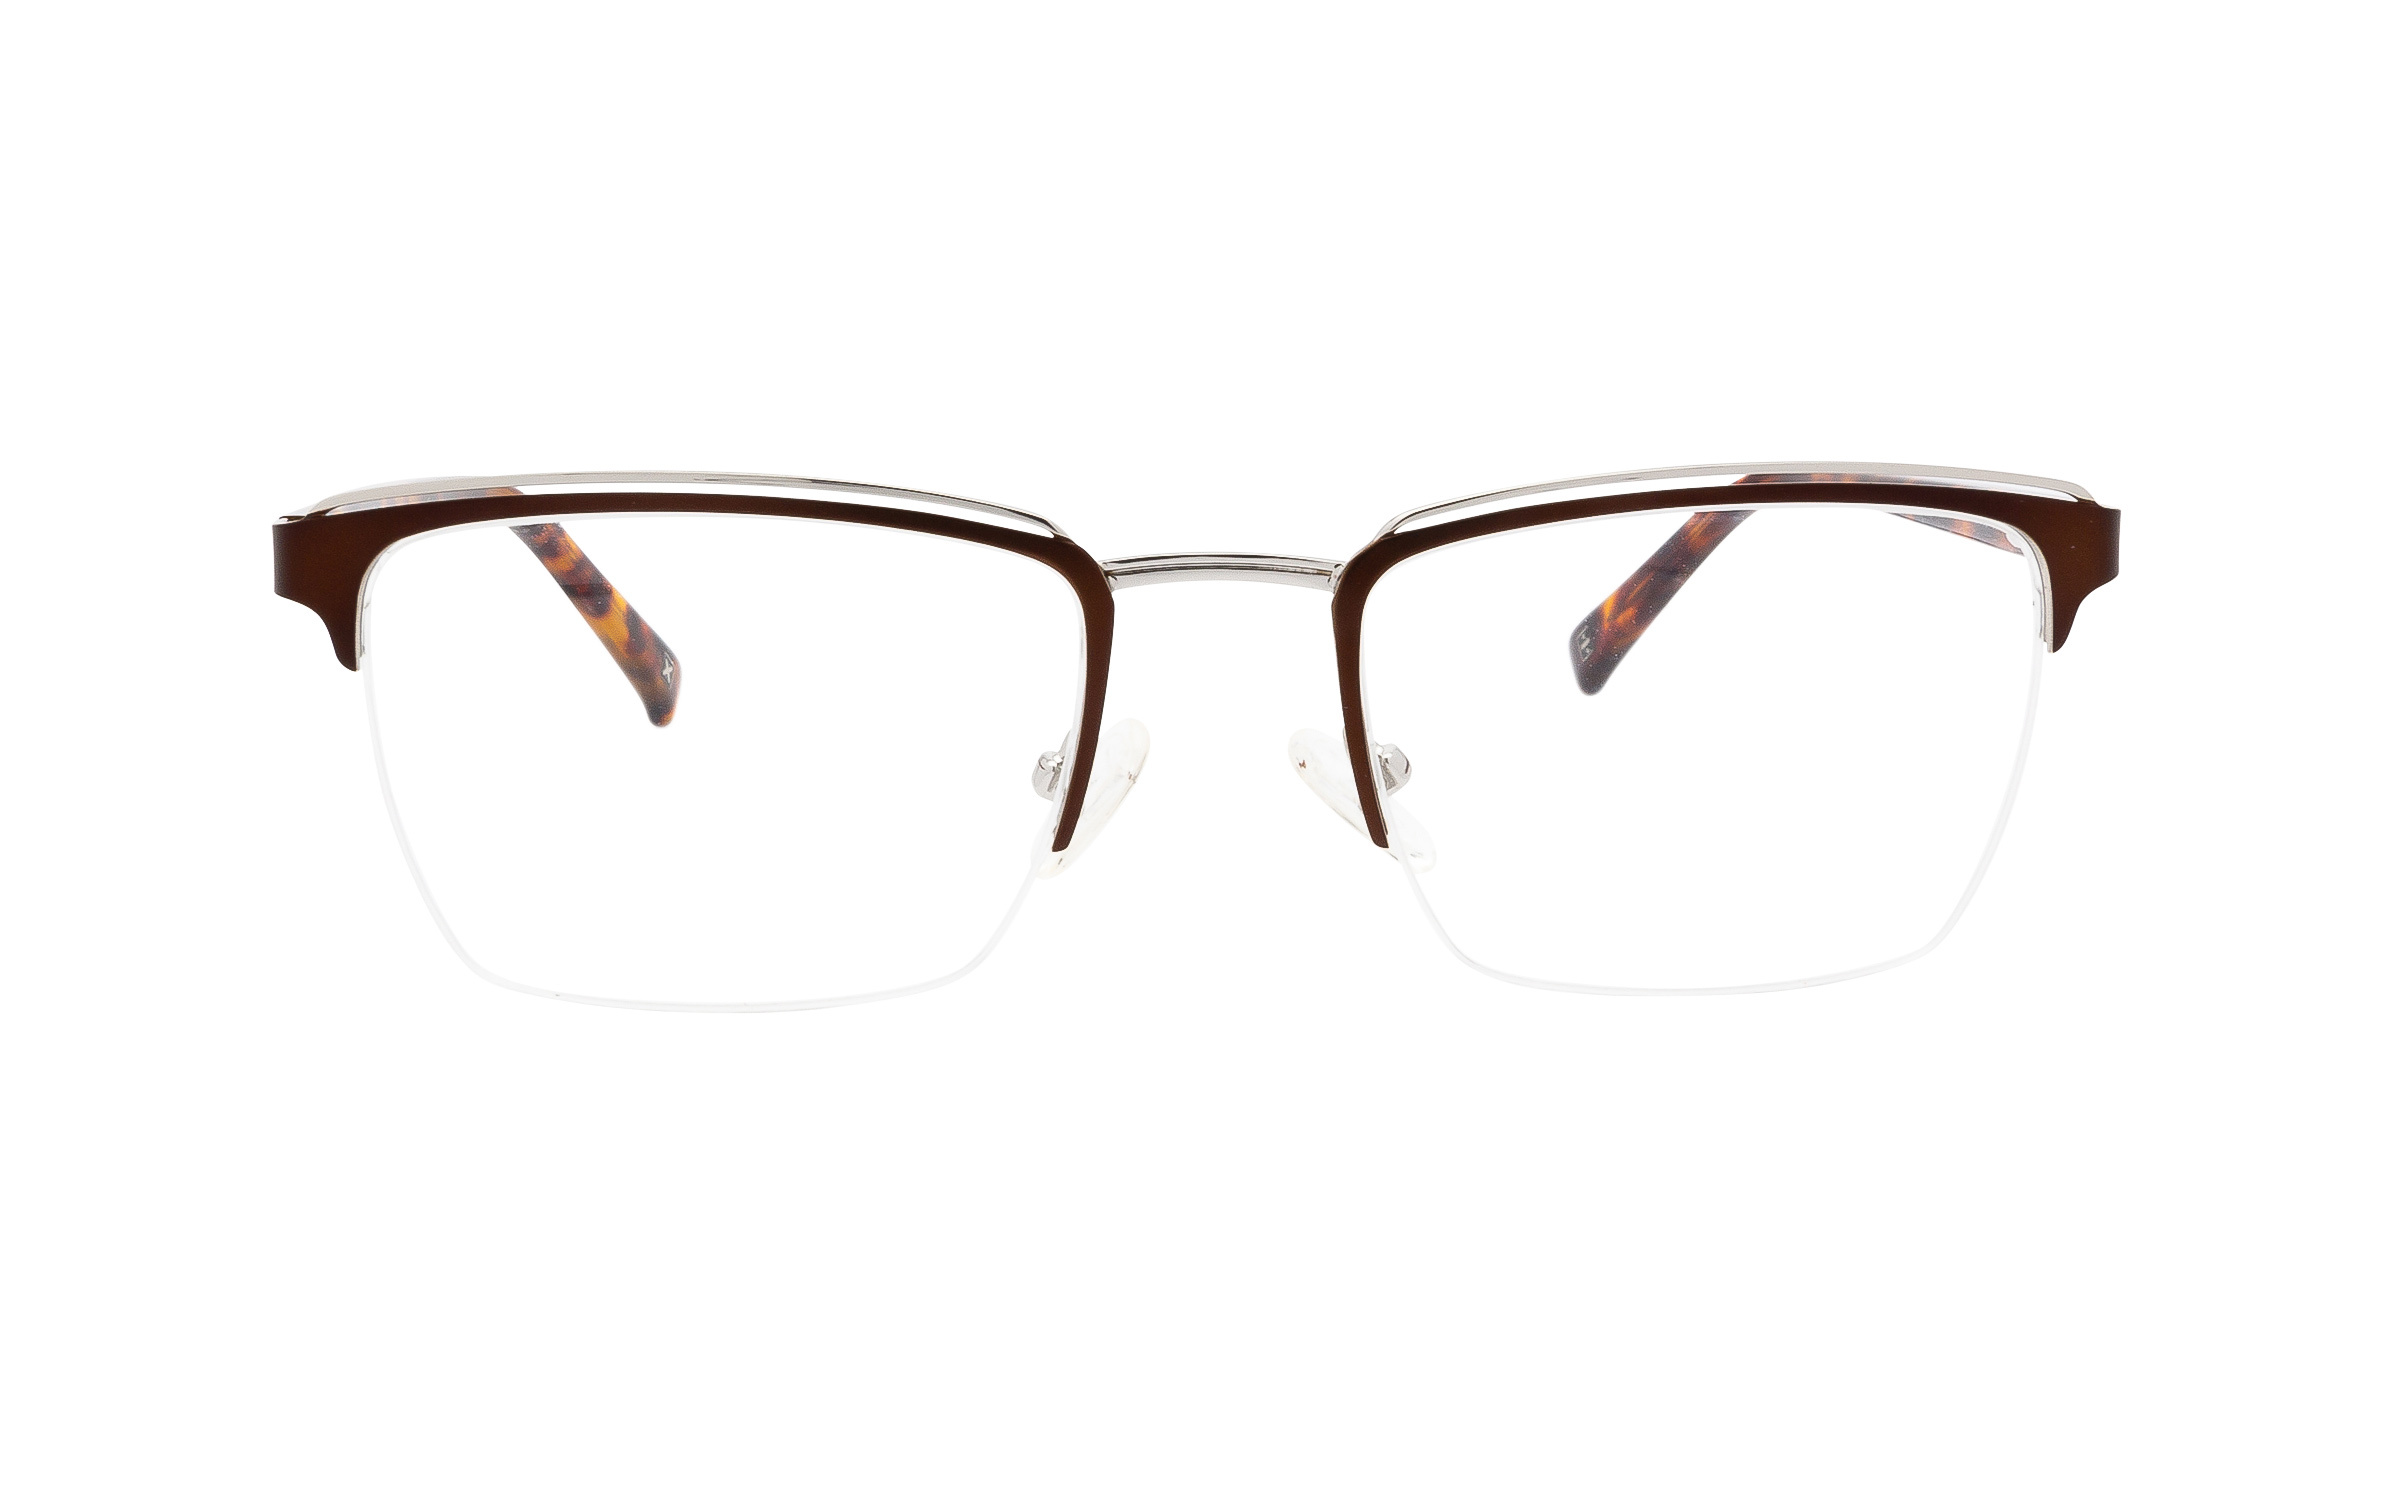 http://www.coastal.com/ - Derek Cardigan Naos DC223 C02 (51) Eyeglasses and Frame in Matte Brown/Silver | Acetate – Online Coastal